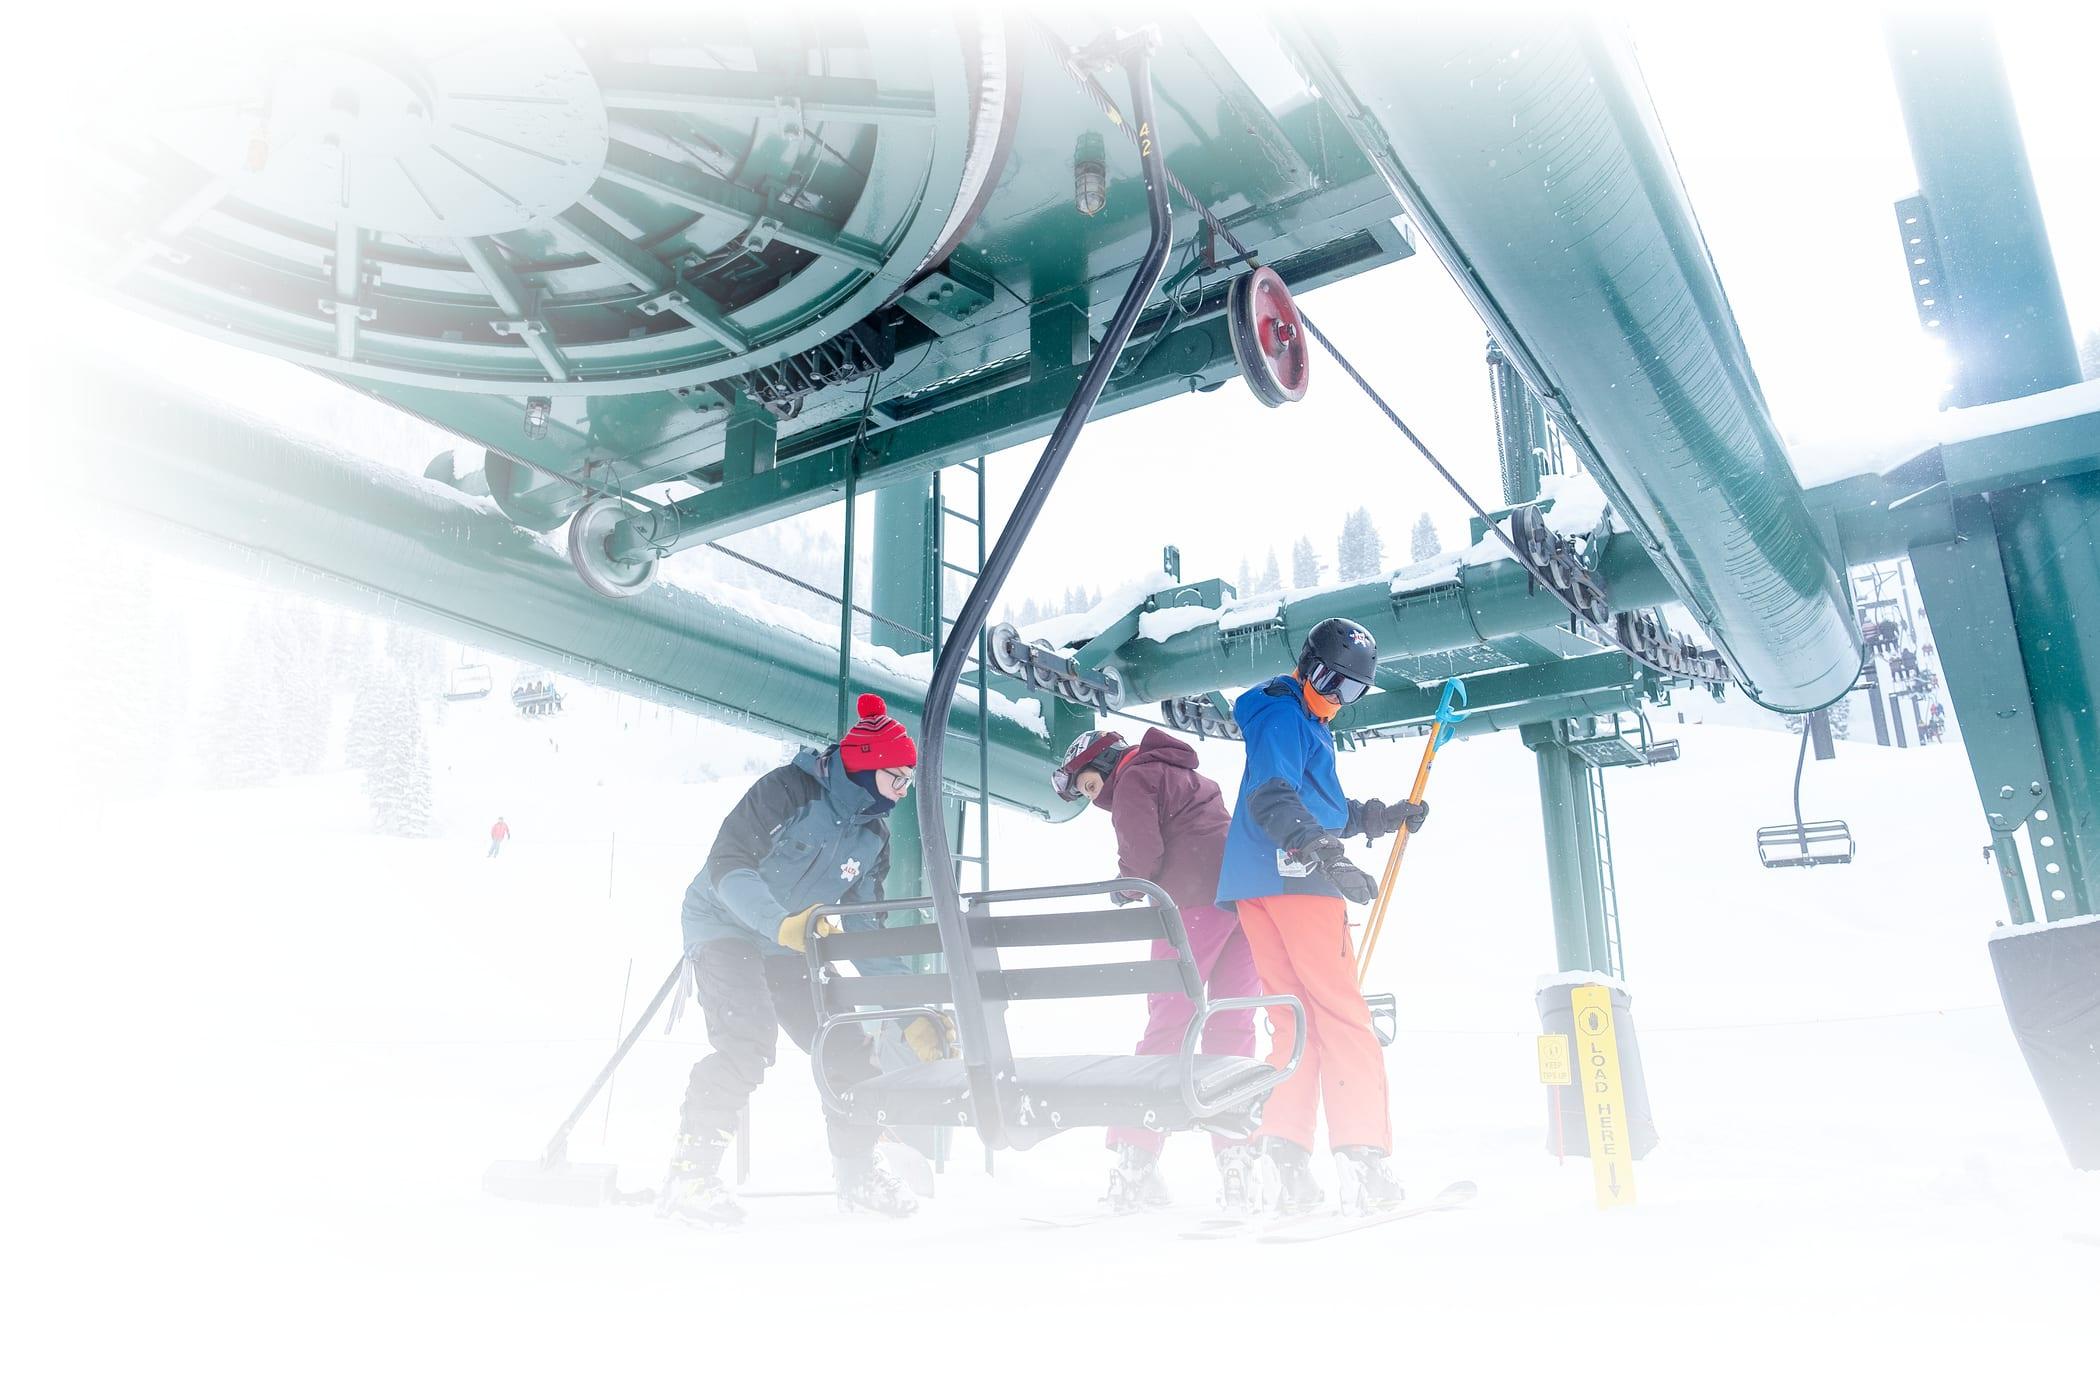 An Alta employee loads two skiers onto Wildcat lift